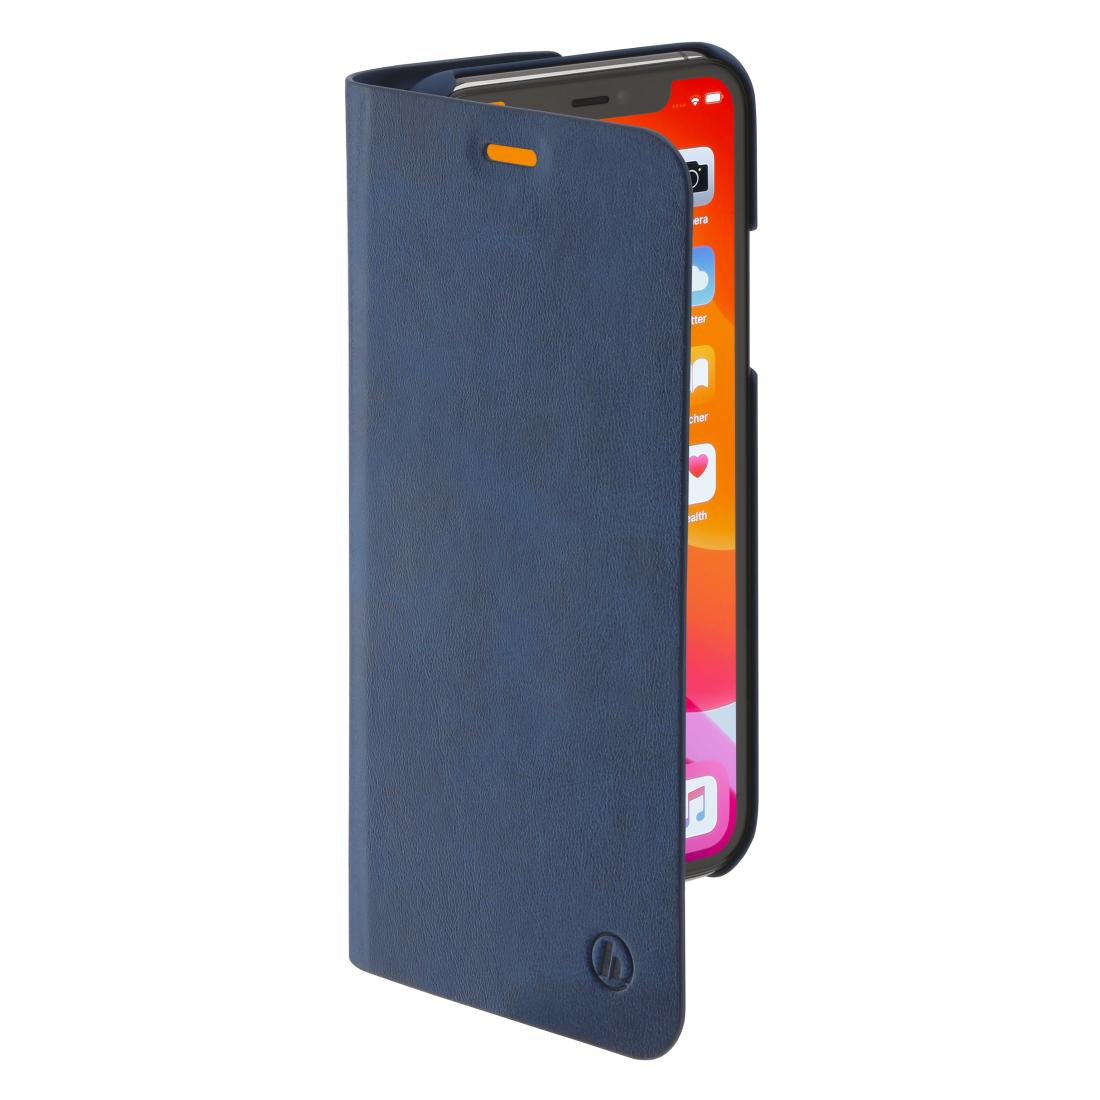 00187382 Hama Booklet Guard Pro Für Apple Iphone 11 Pro